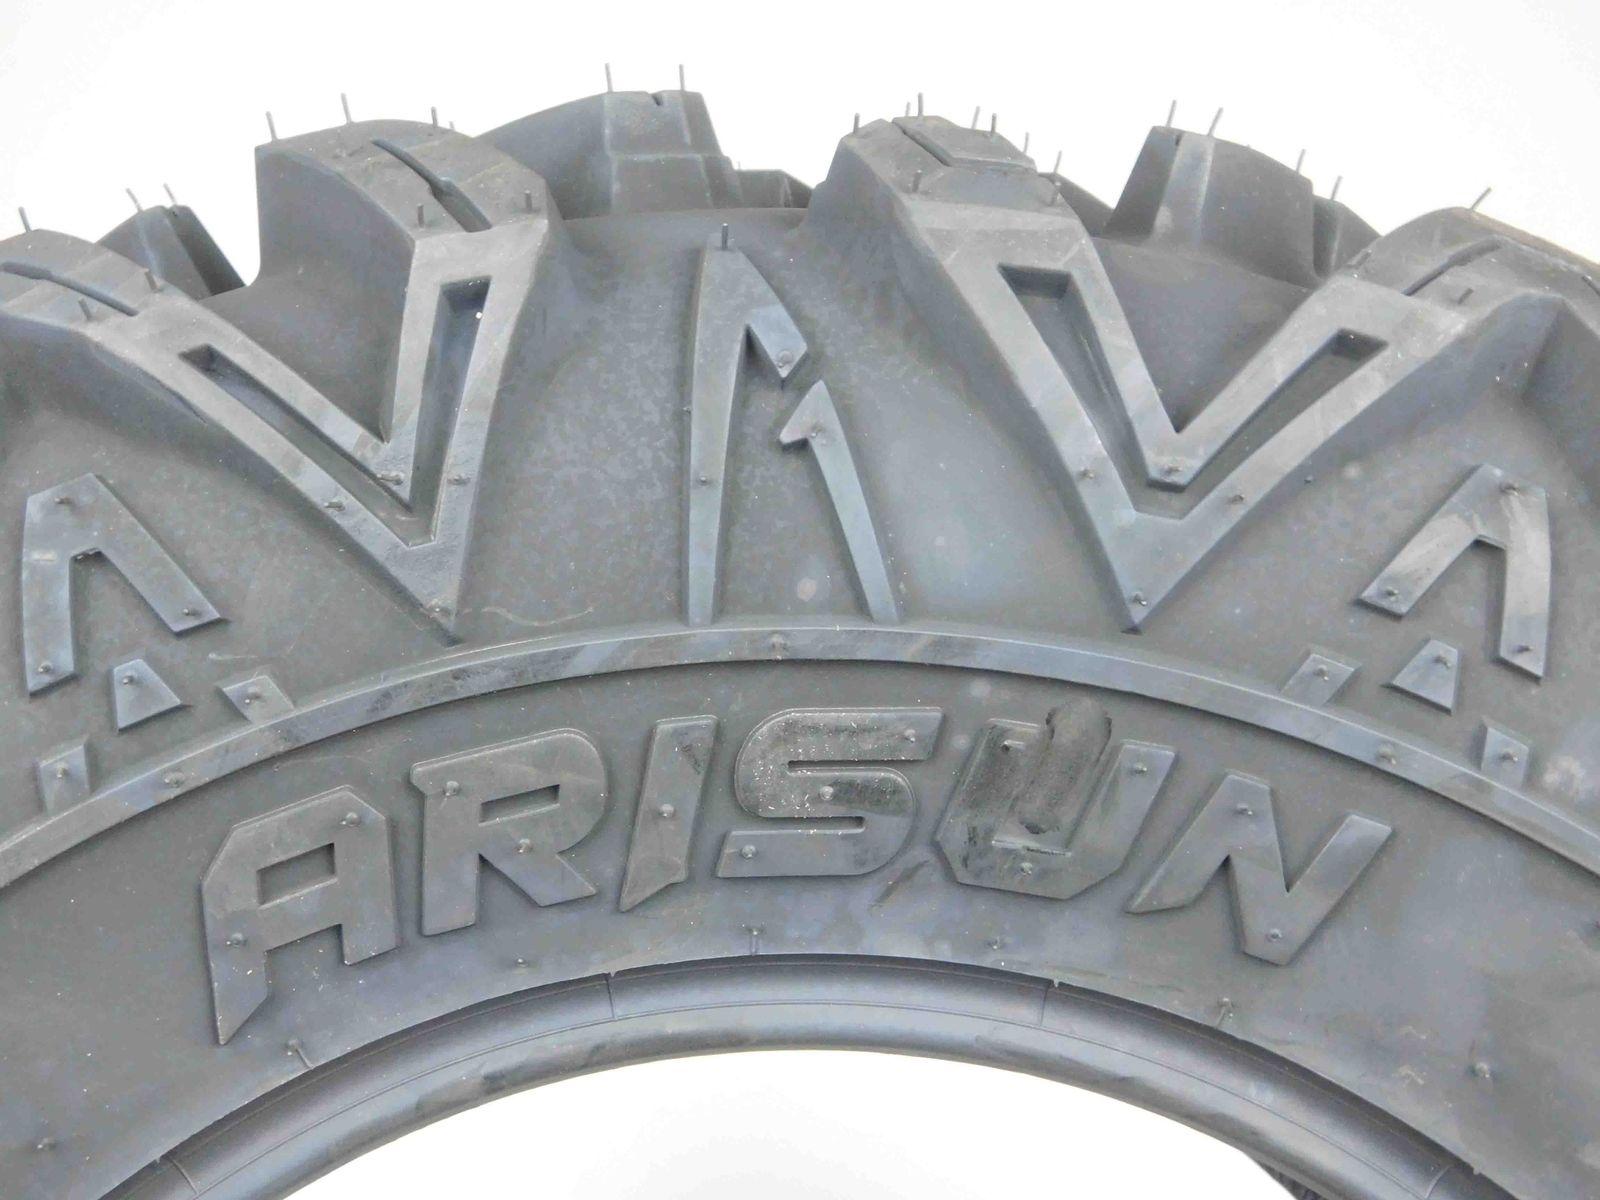 Arisun-28x10-14-Tires-Bruiser-XT-RADIAL-8ply-255-70R14-N4D-Protection-image-2